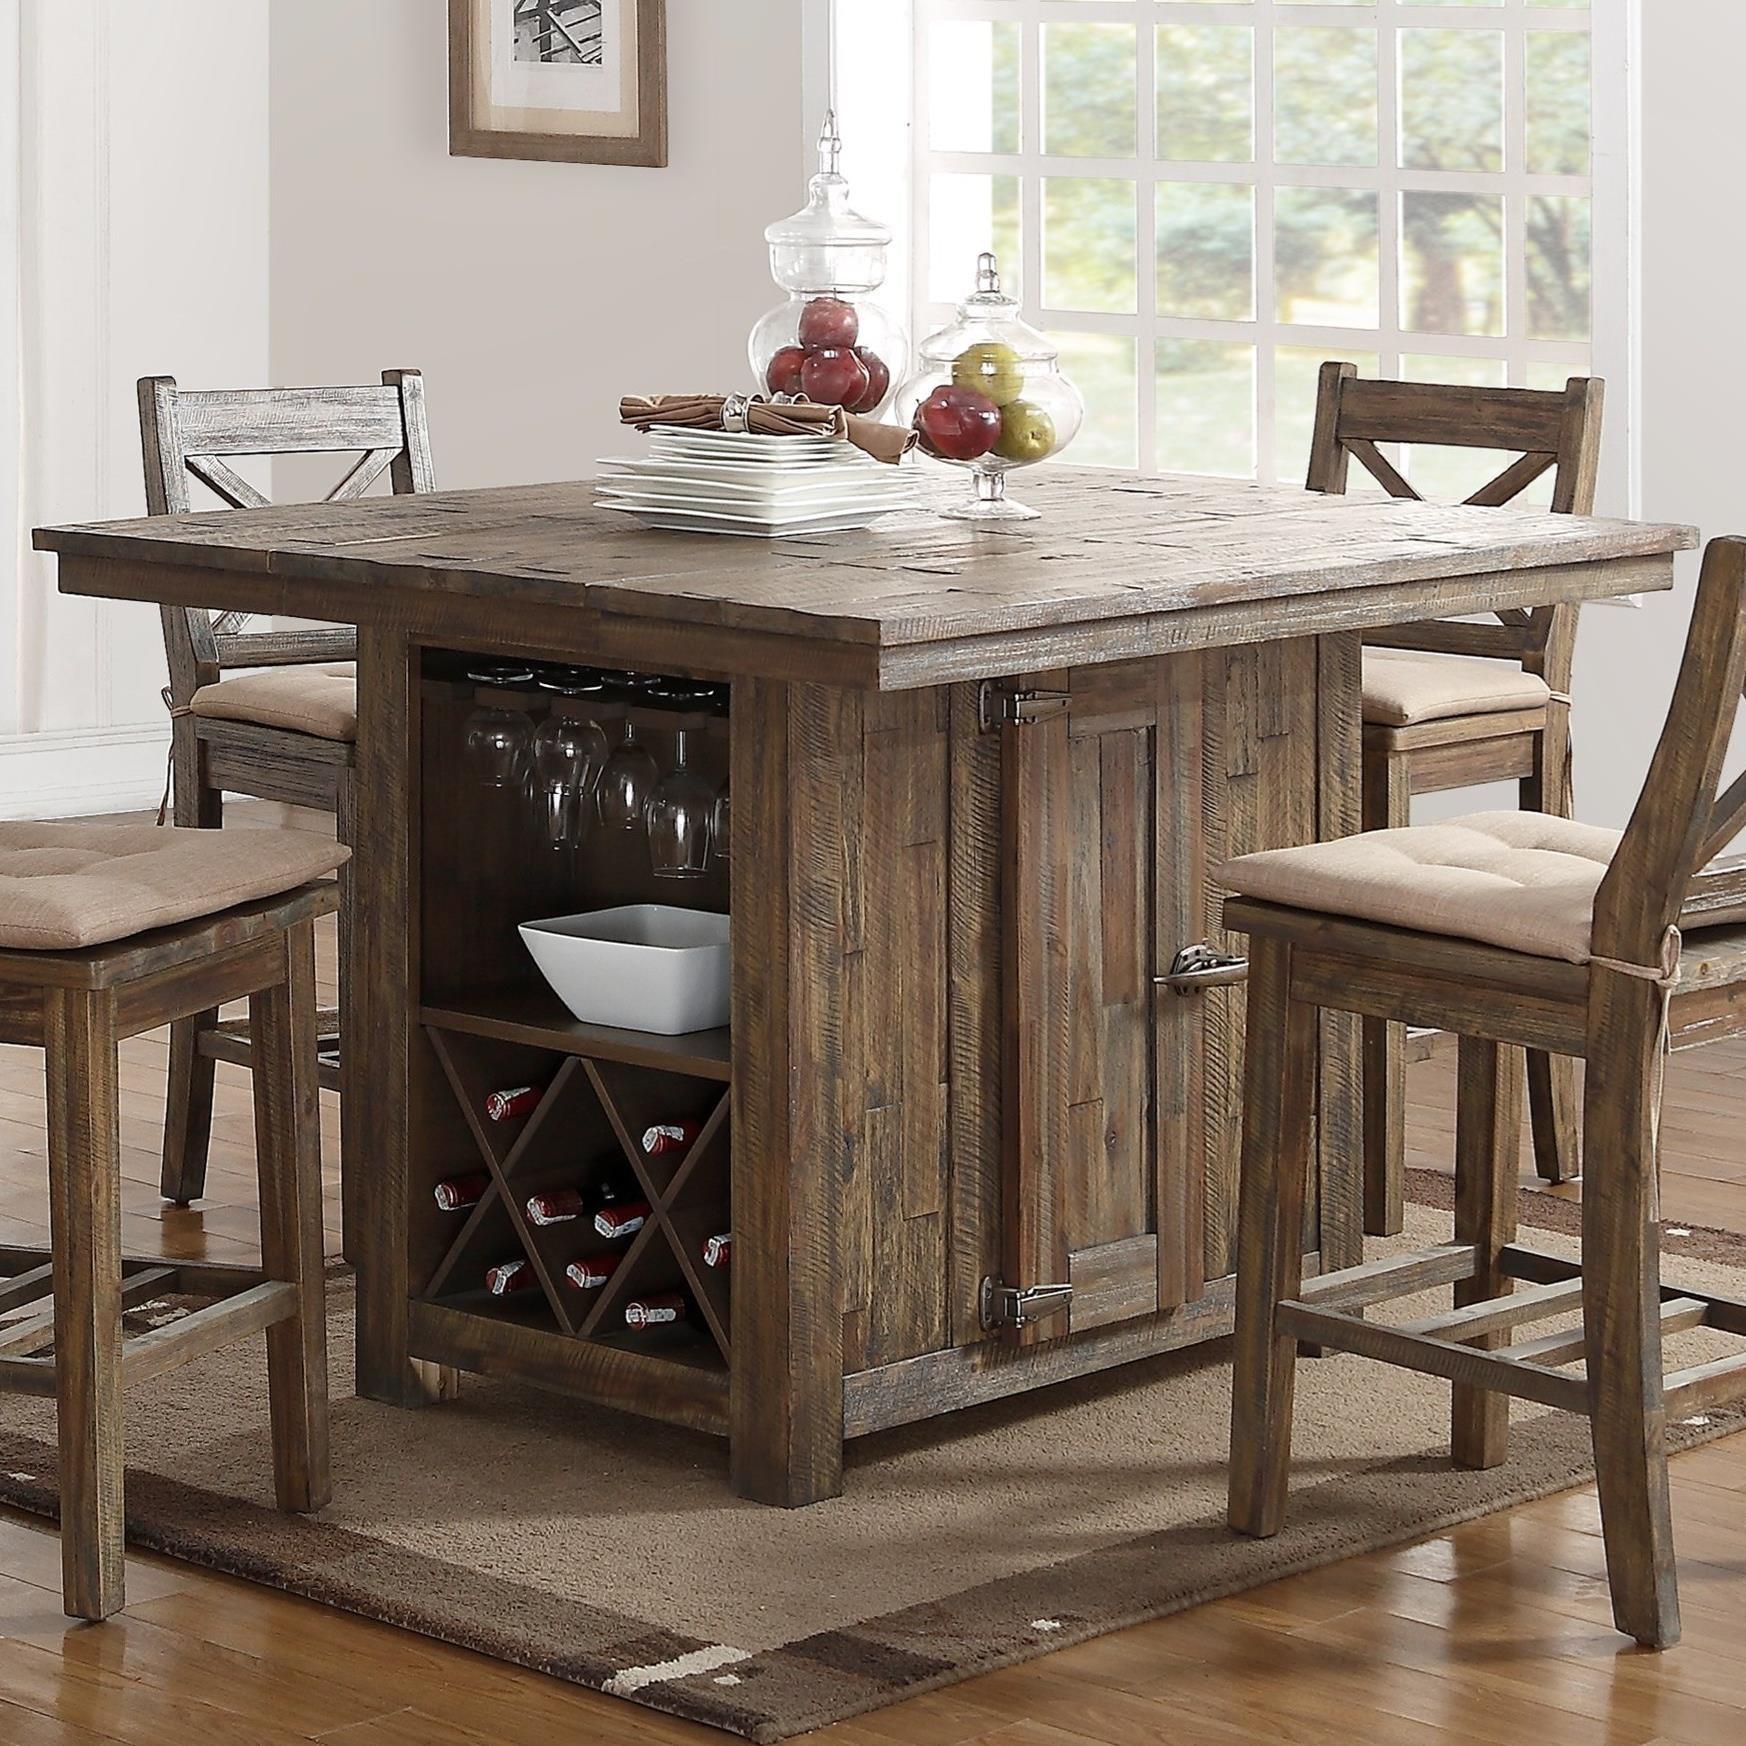 new classic tuscany park d7404 18 pub table with wine glass and rh dunkandbright com noah pub dining room set